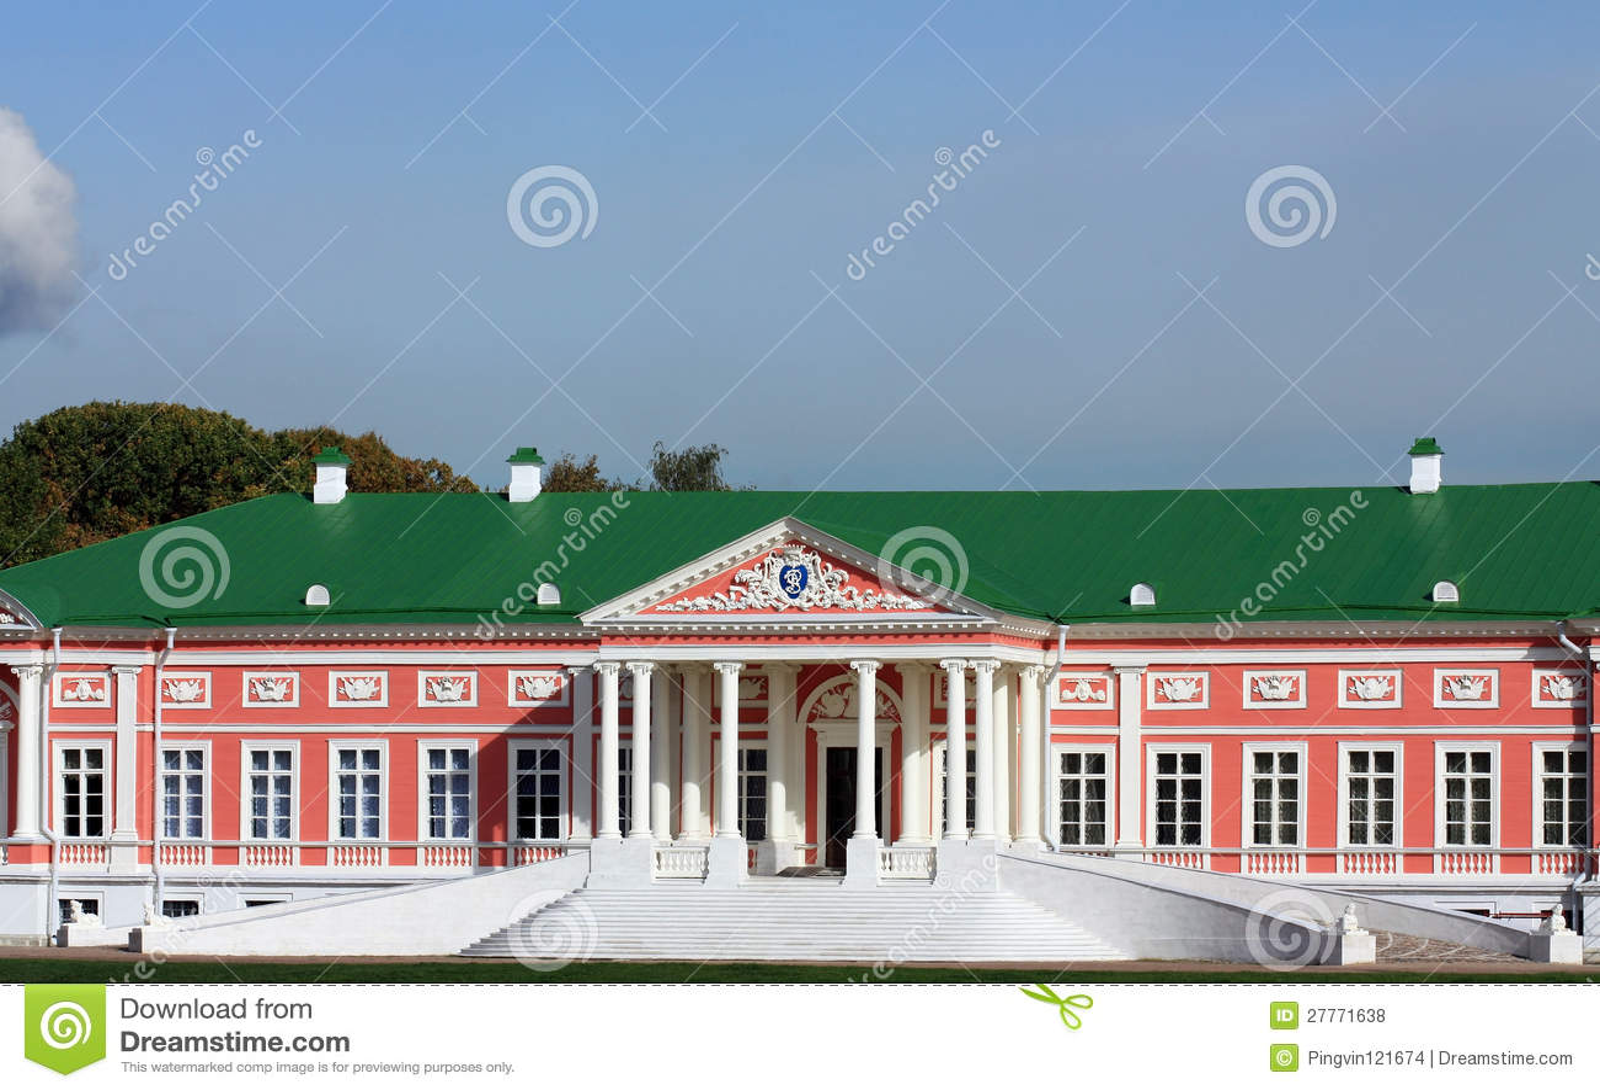 Patrimoine de Kuskovo. Façade du palais ducal